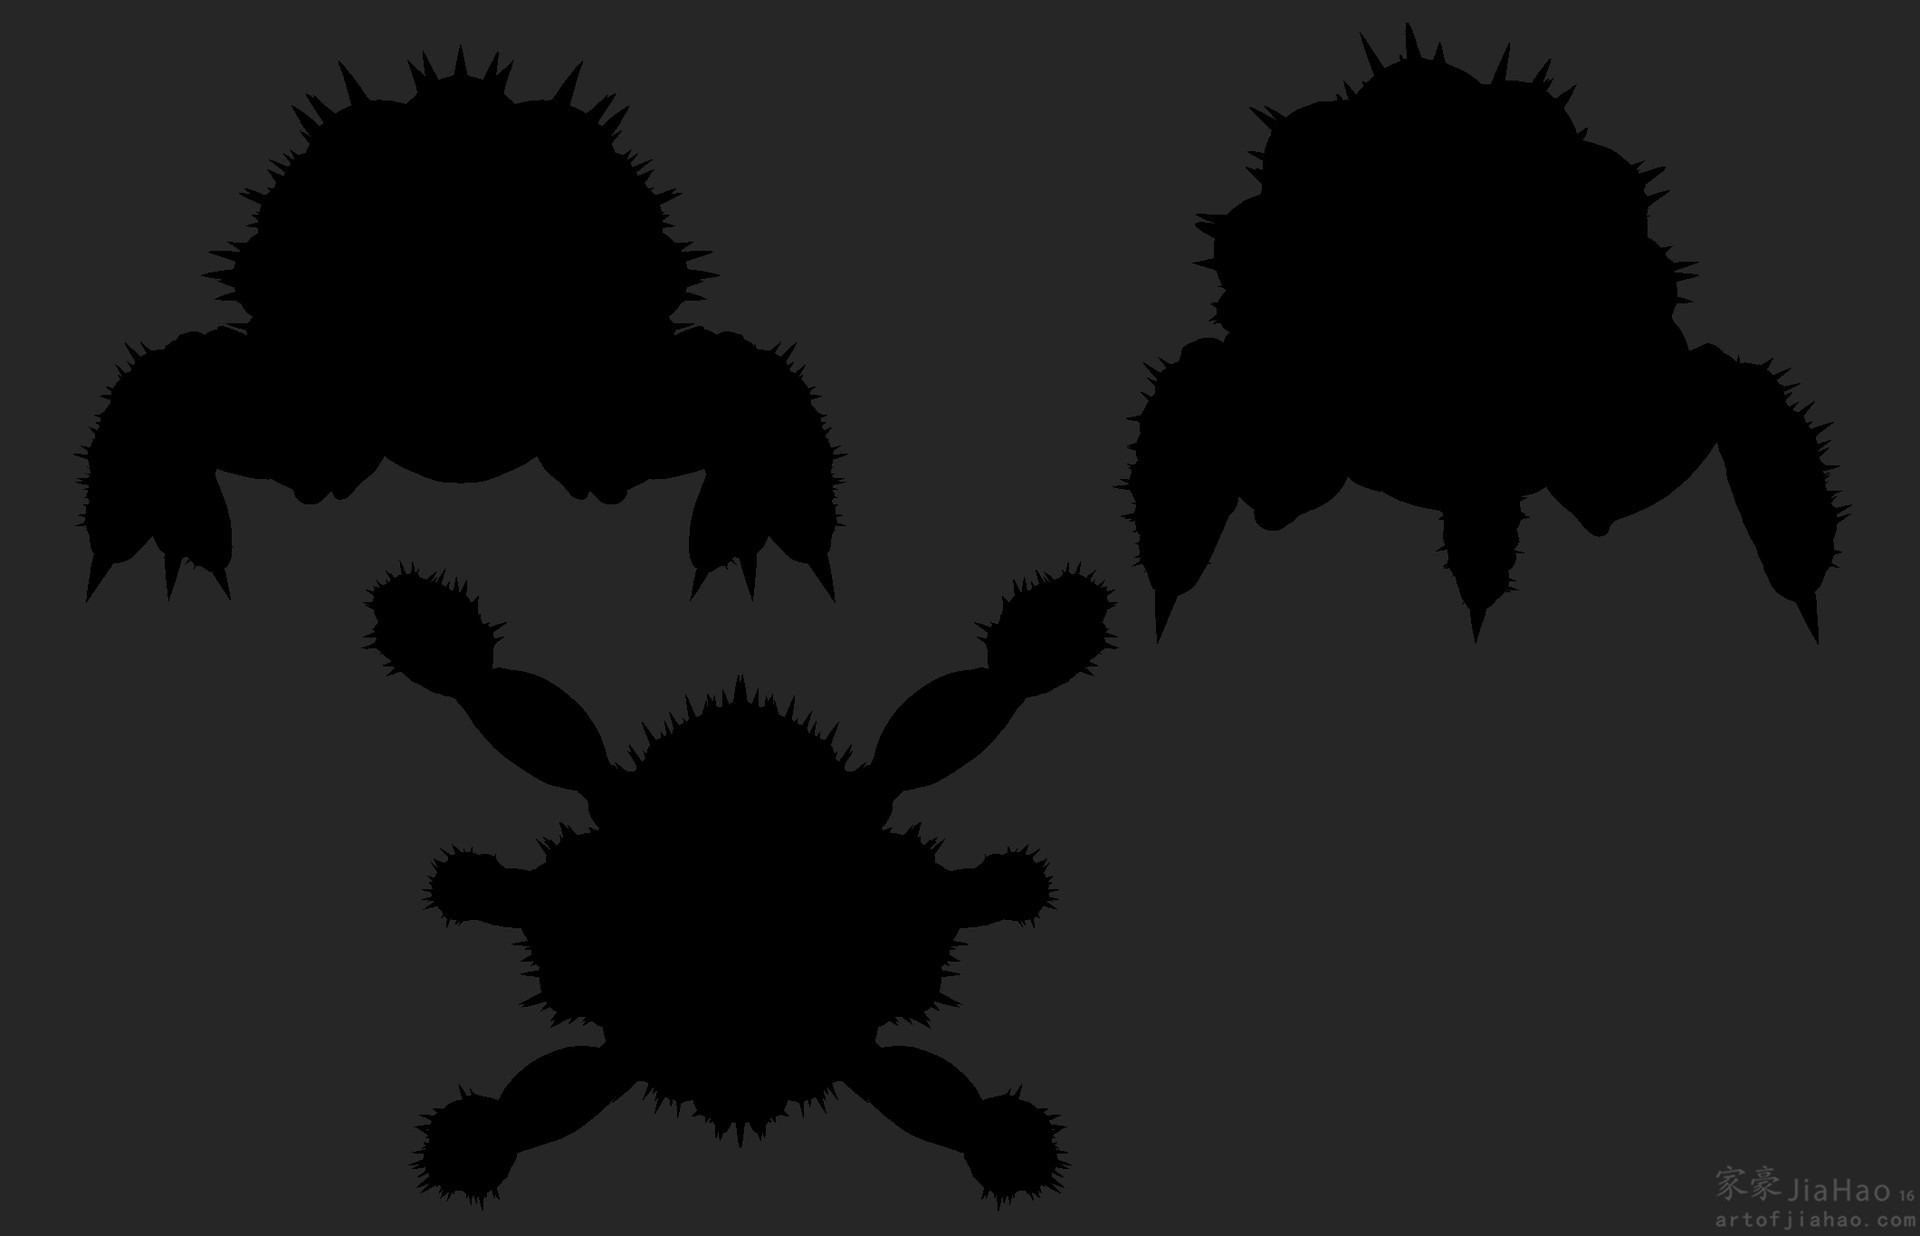 Jia hao 2016 09 spikycrabcreature unposedsilouhette